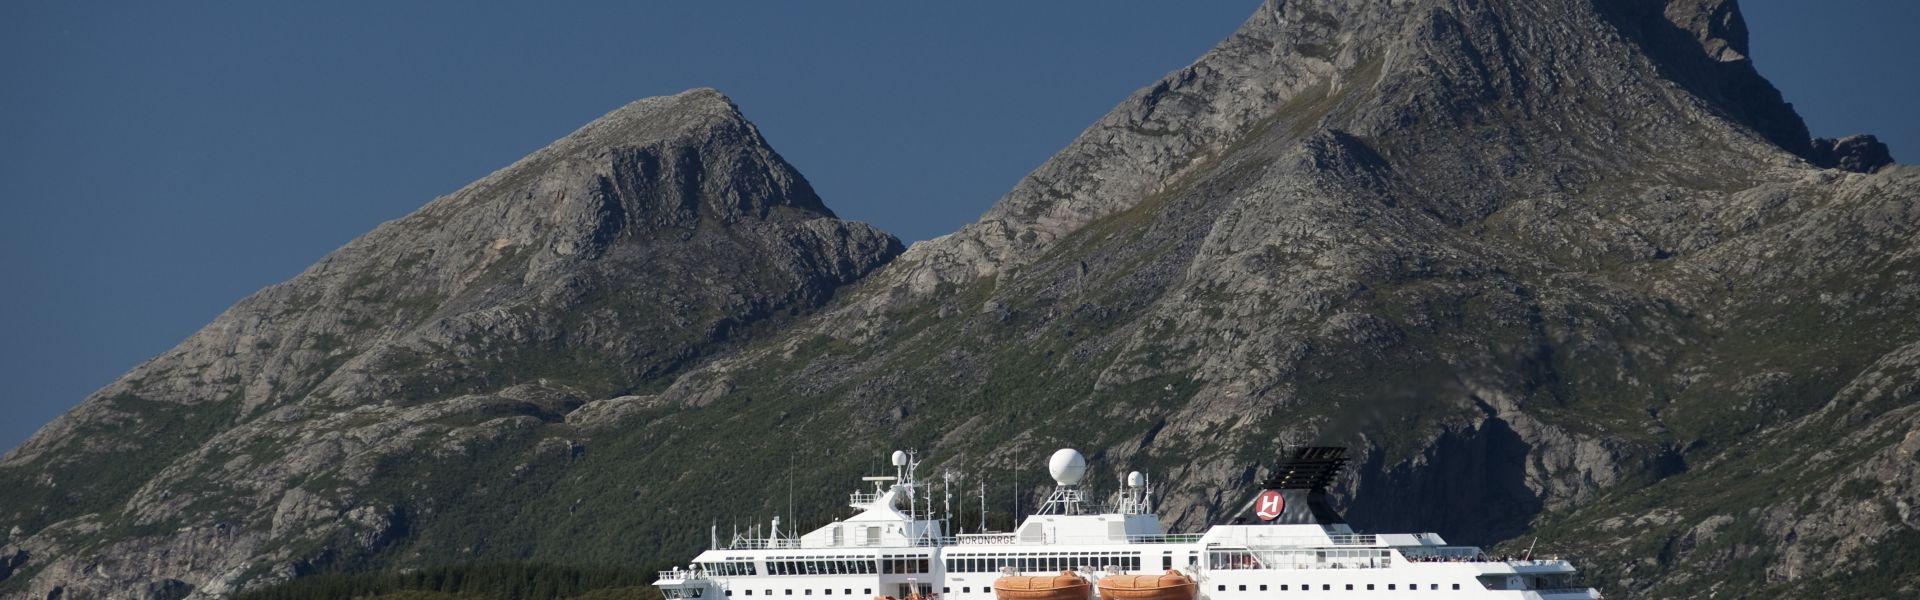 Croaziera 2017 - Scandinavia si Fiordurile Norvegiene (Kirkenes) - Hurtigruten - MS Nordnorge - 5 nopti